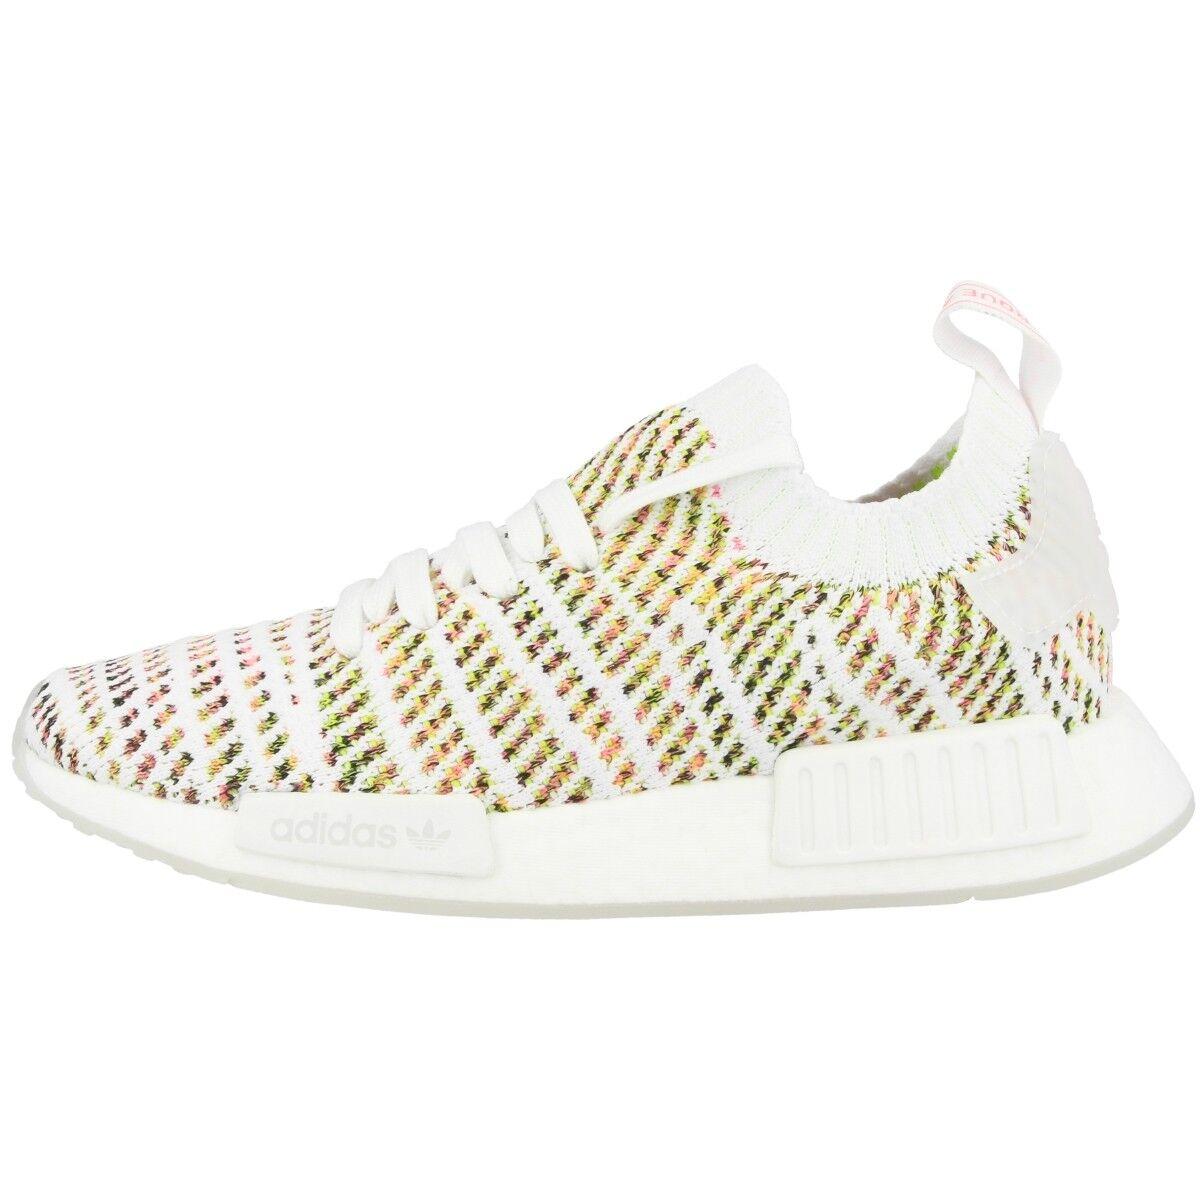 Adidas Nmd _R1 Stlt Pk Primeknit chaussures Donne baskets femmes Bianco jaune B43838